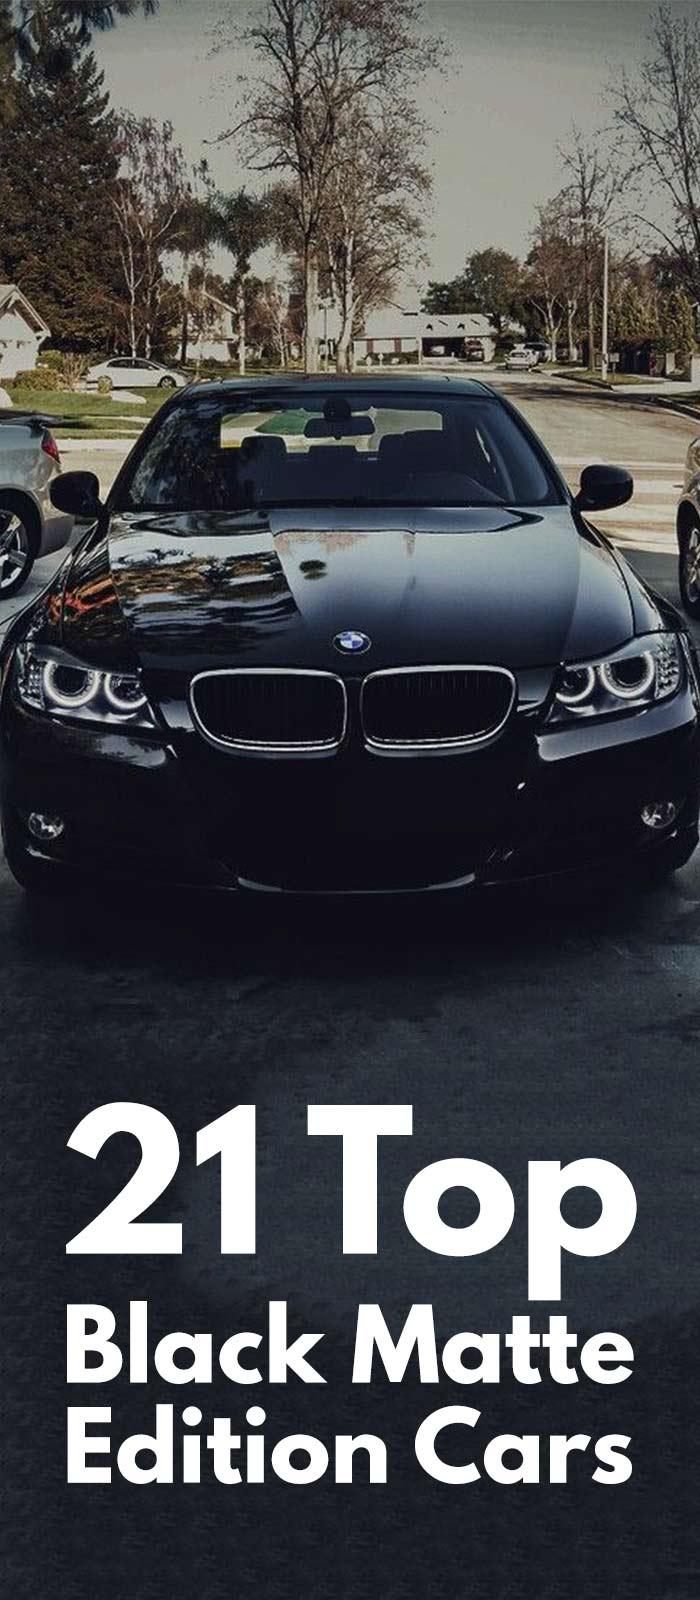 21 TOP BLACK MATTE EDITION CARS.